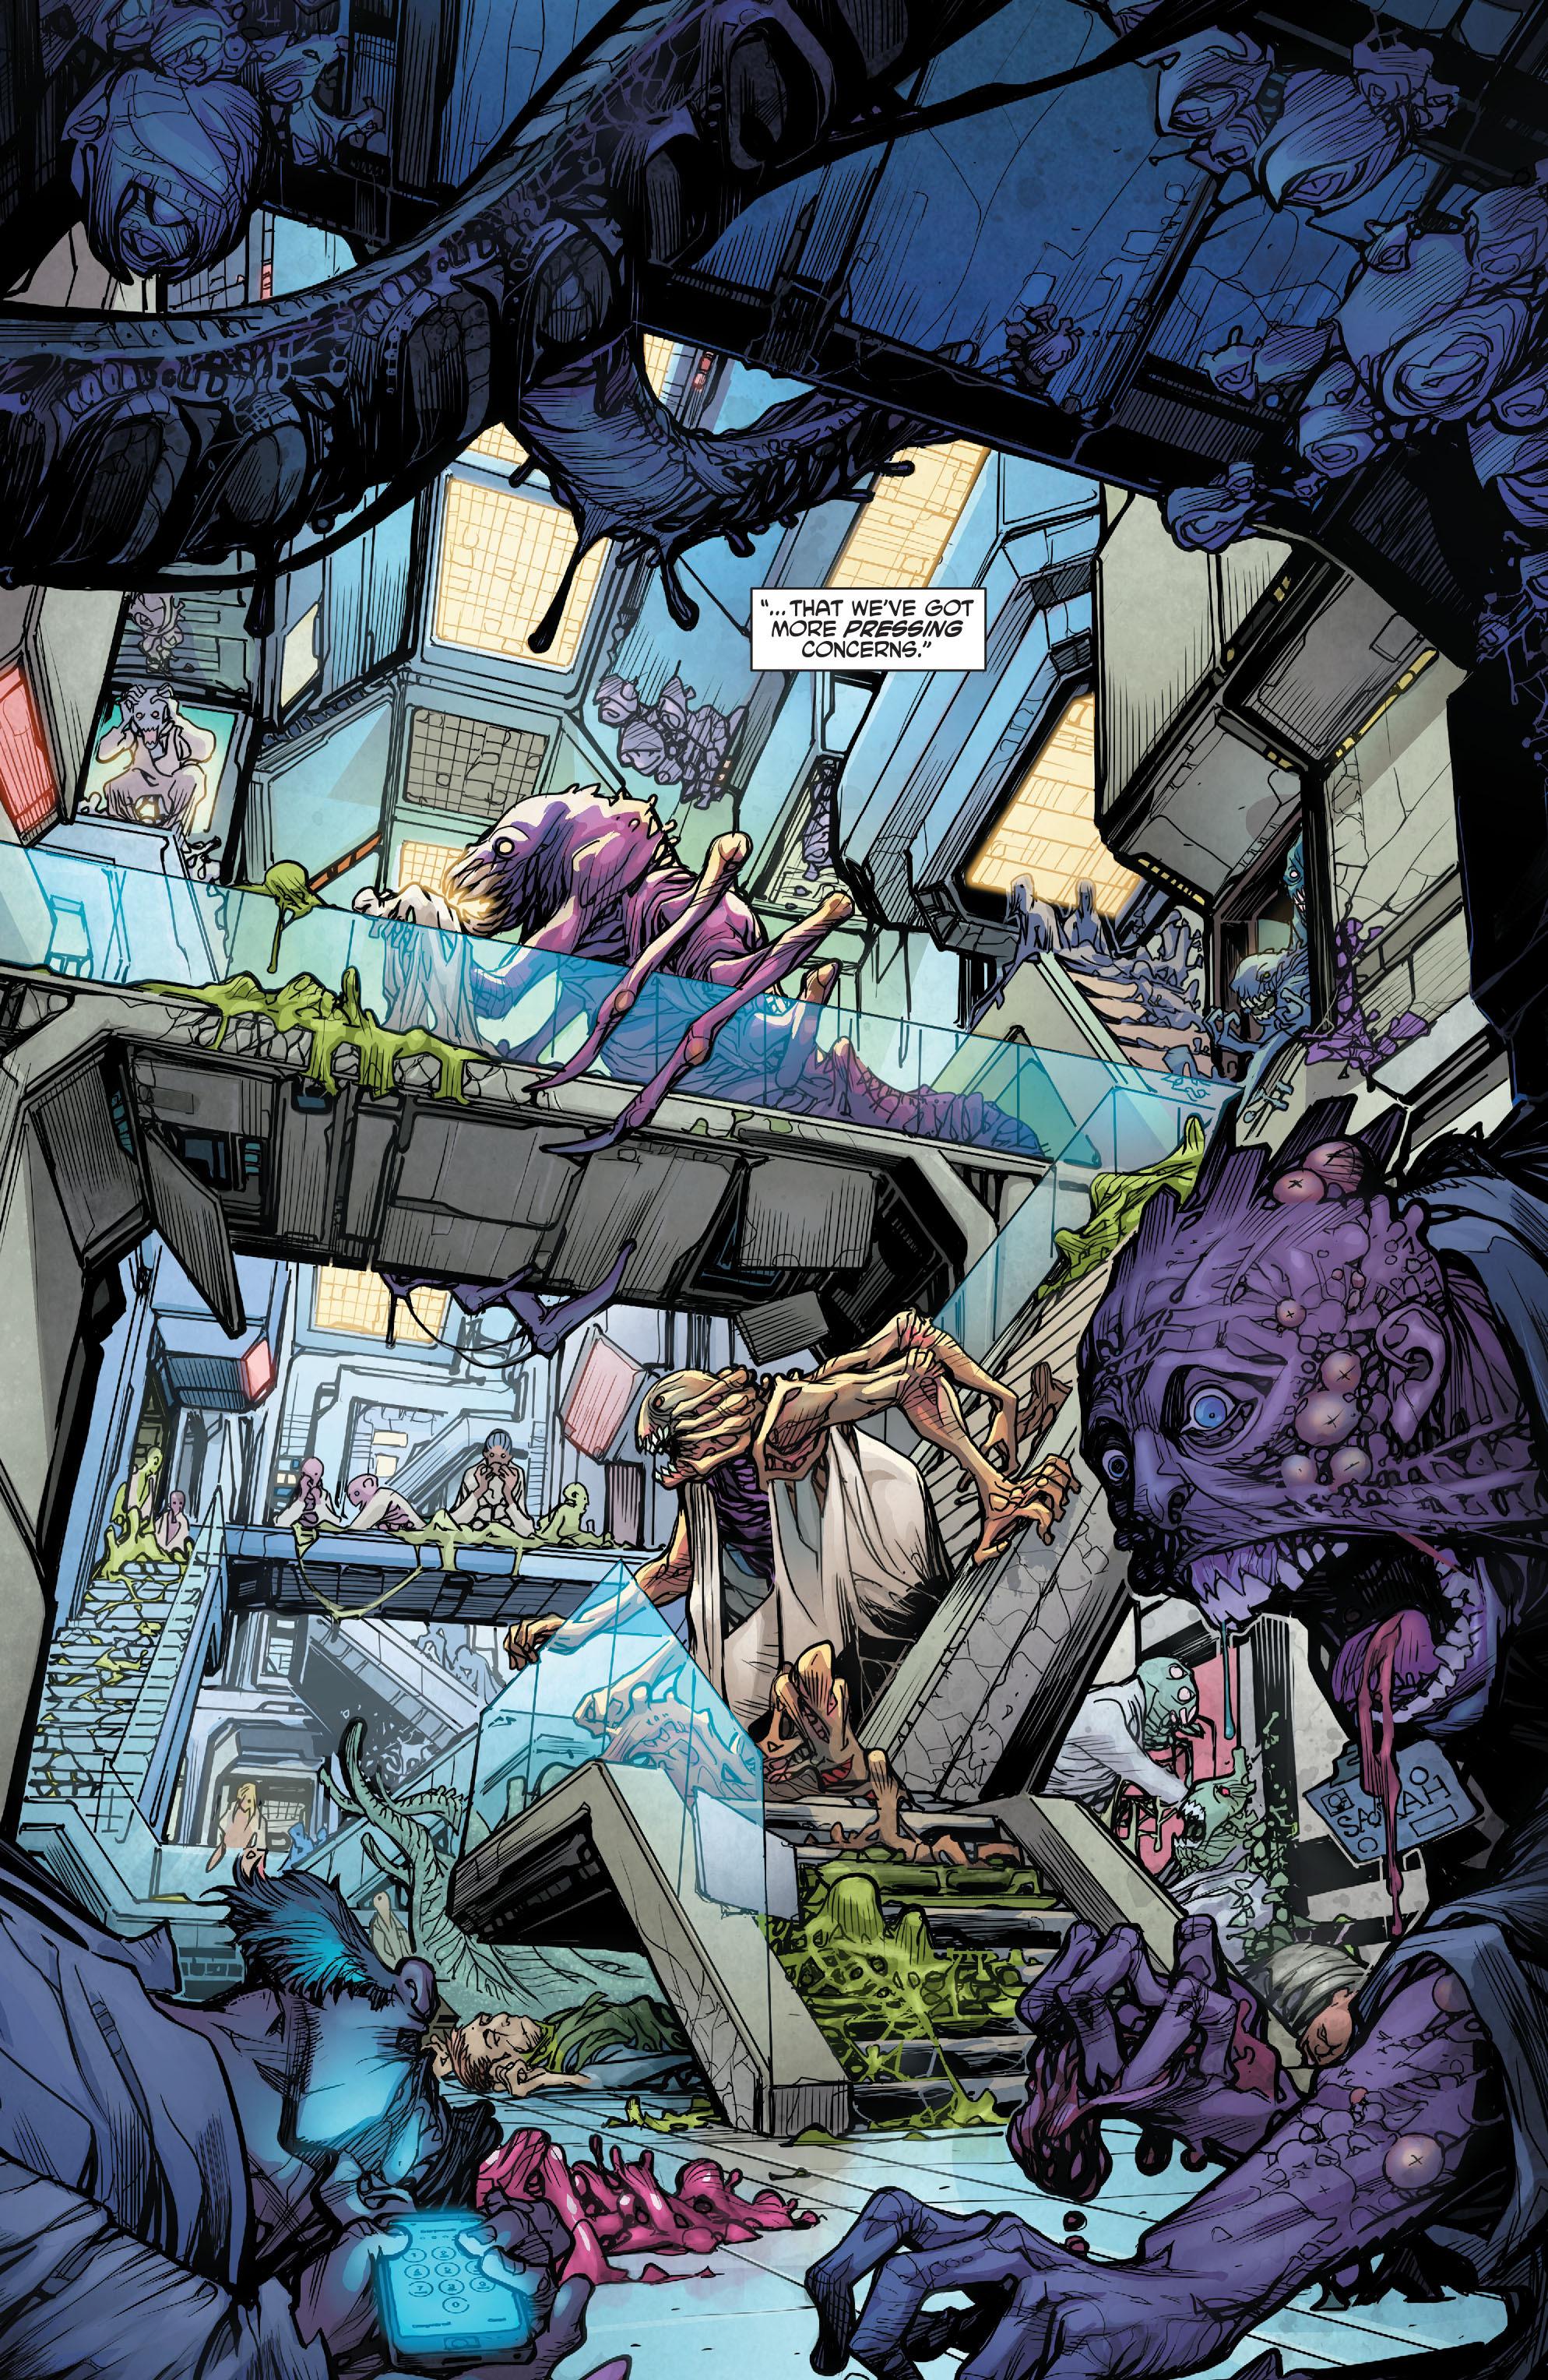 Read online Scooby Apocalypse comic -  Issue #2 - 13